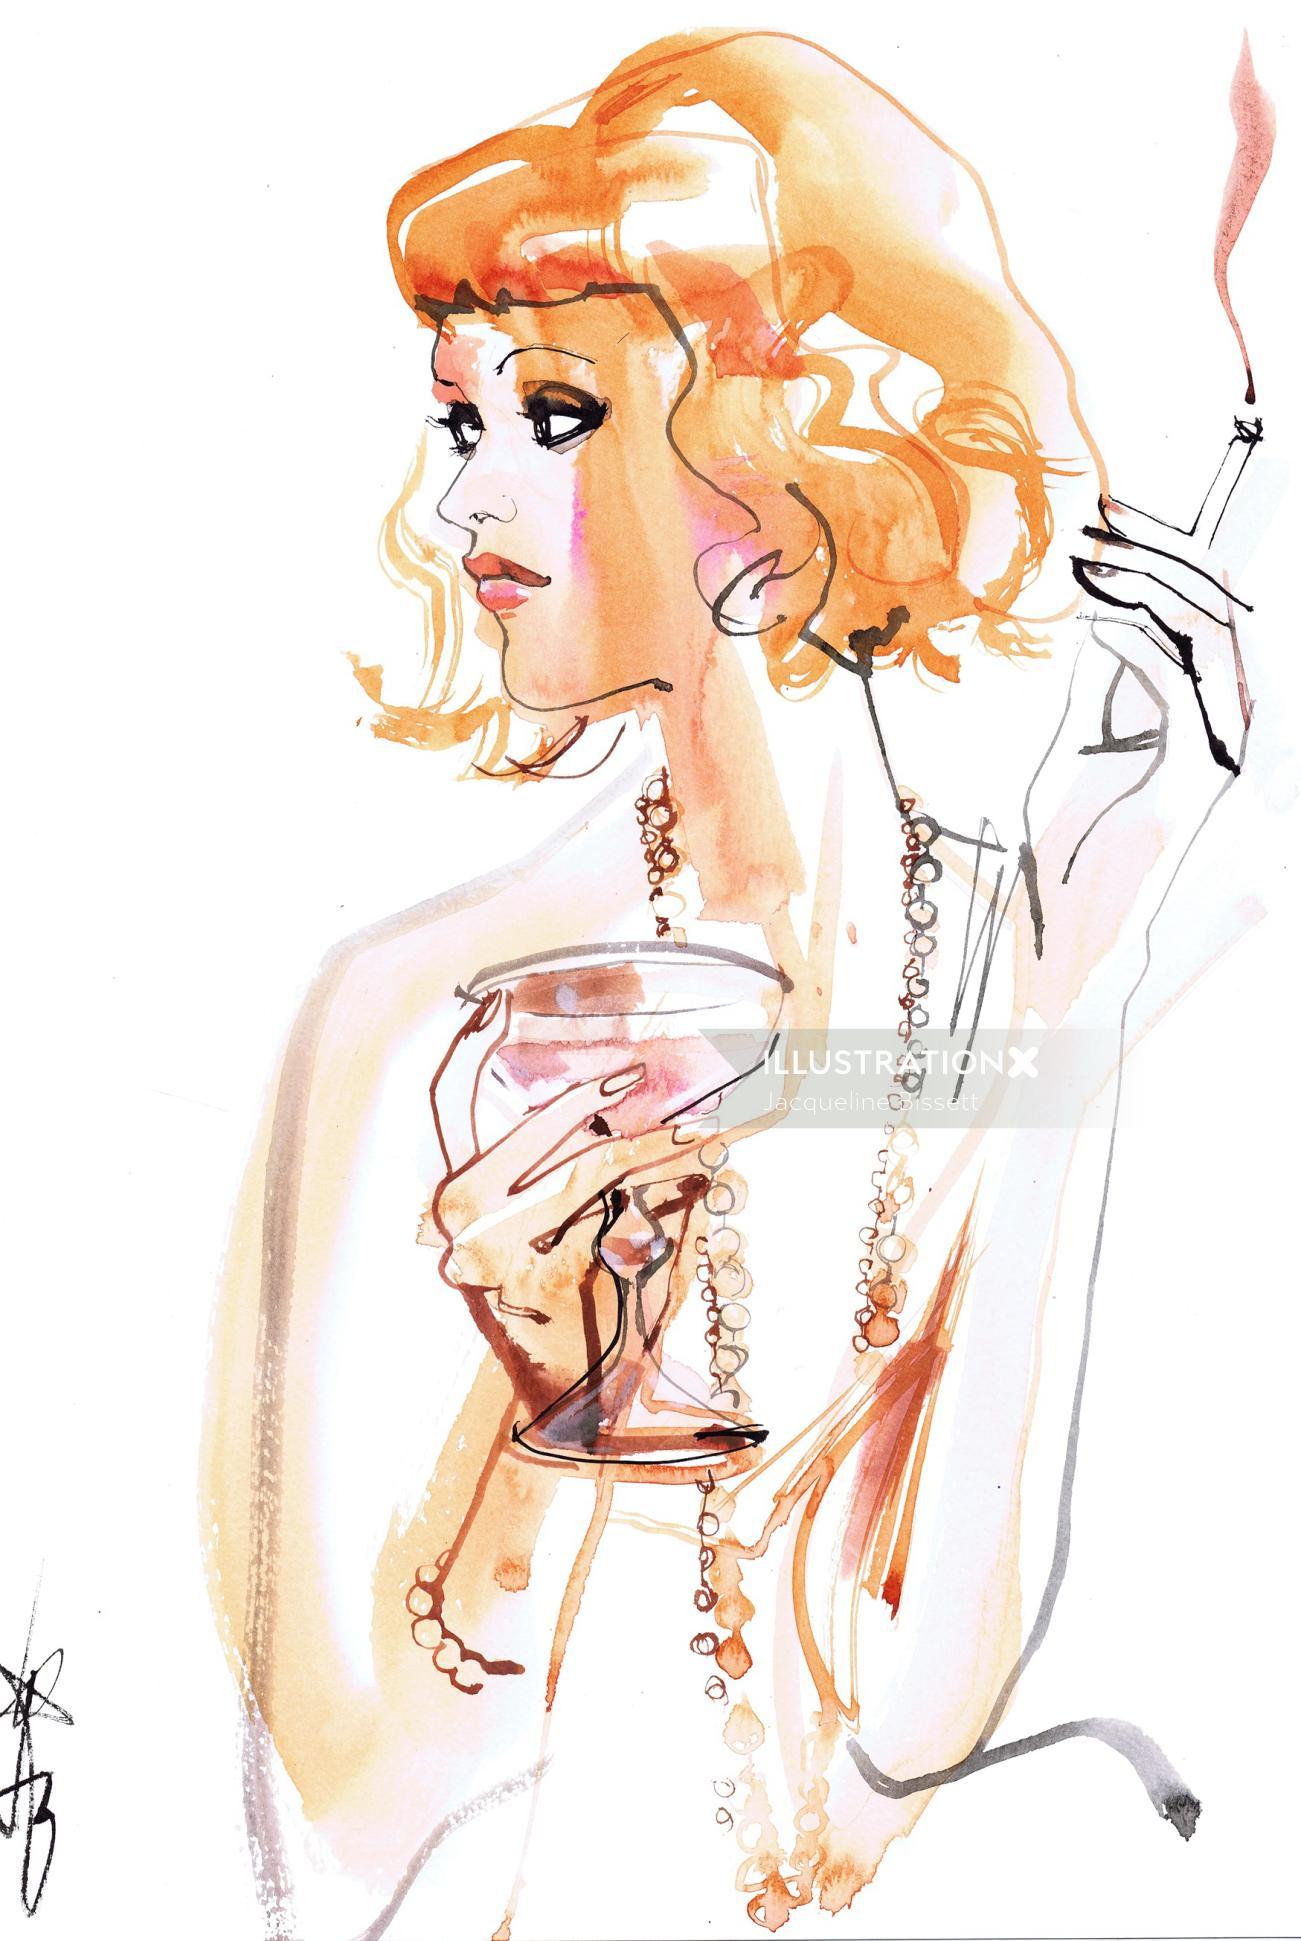 Fashion illustration of grey hair smoking girl